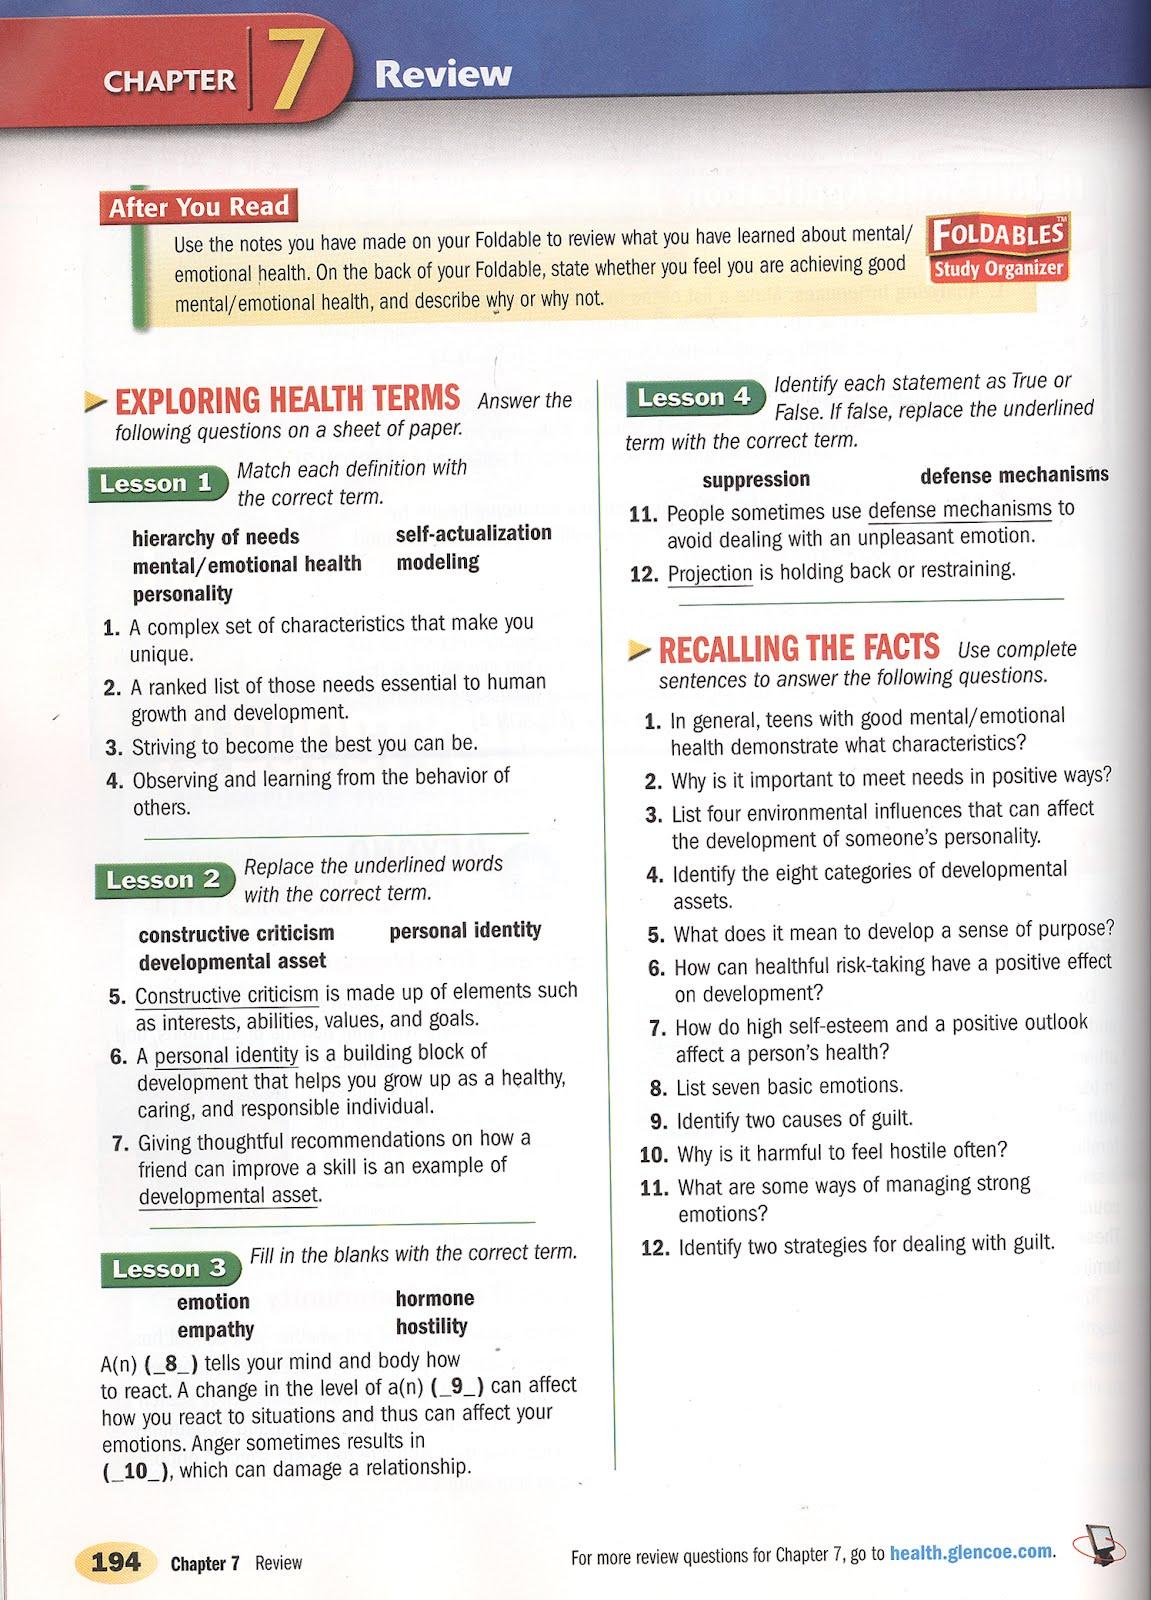 MCSM Health: March 2012